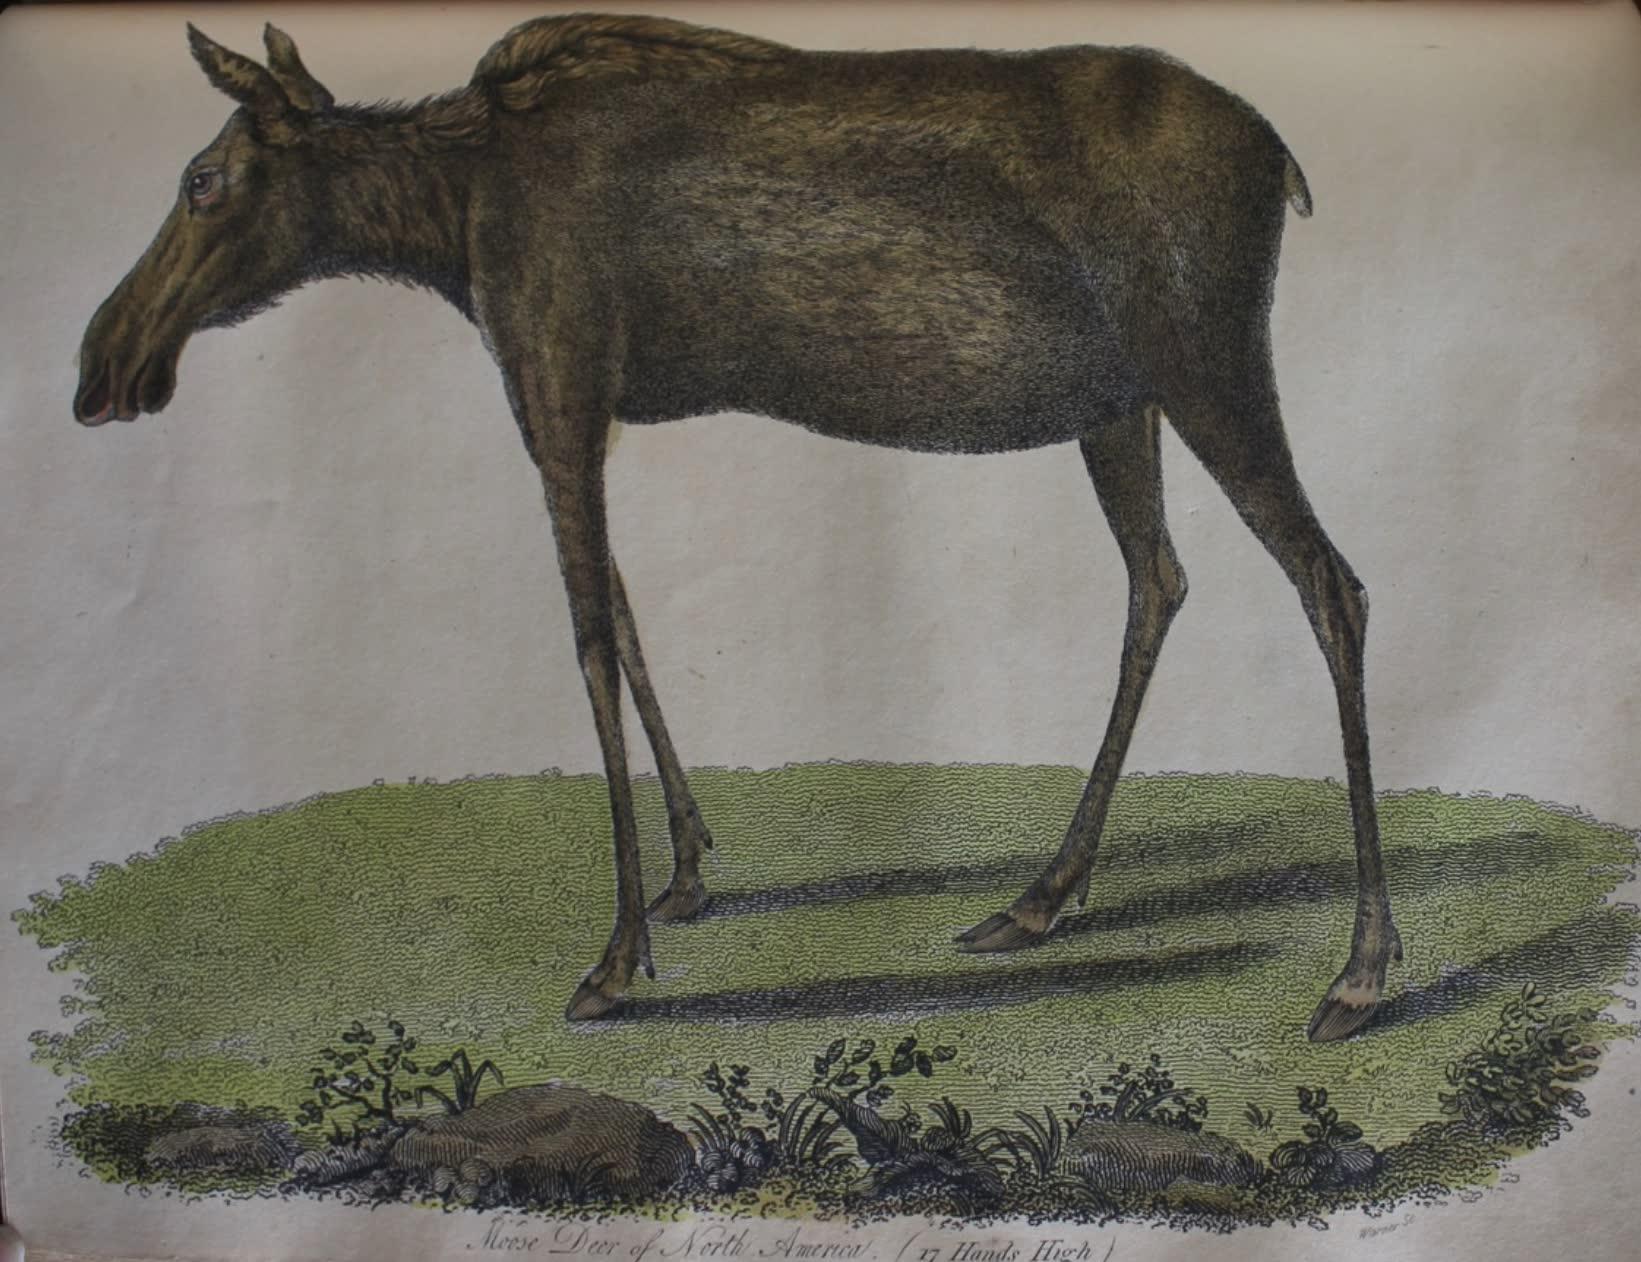 Travels Through the Canadas - Moose Deer (1807)